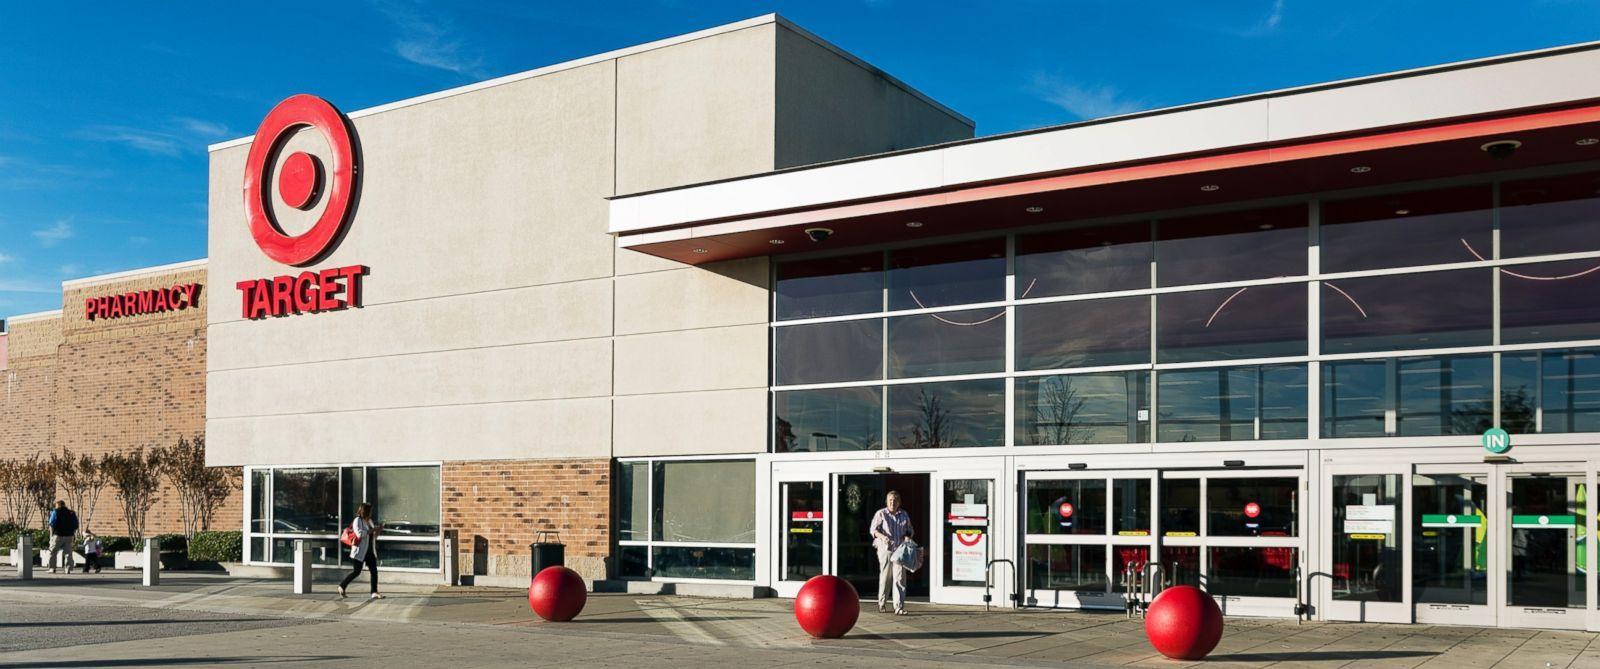 PHOTO: A Target store in Bethlehem, Georgia, Nov. 13, 2015.